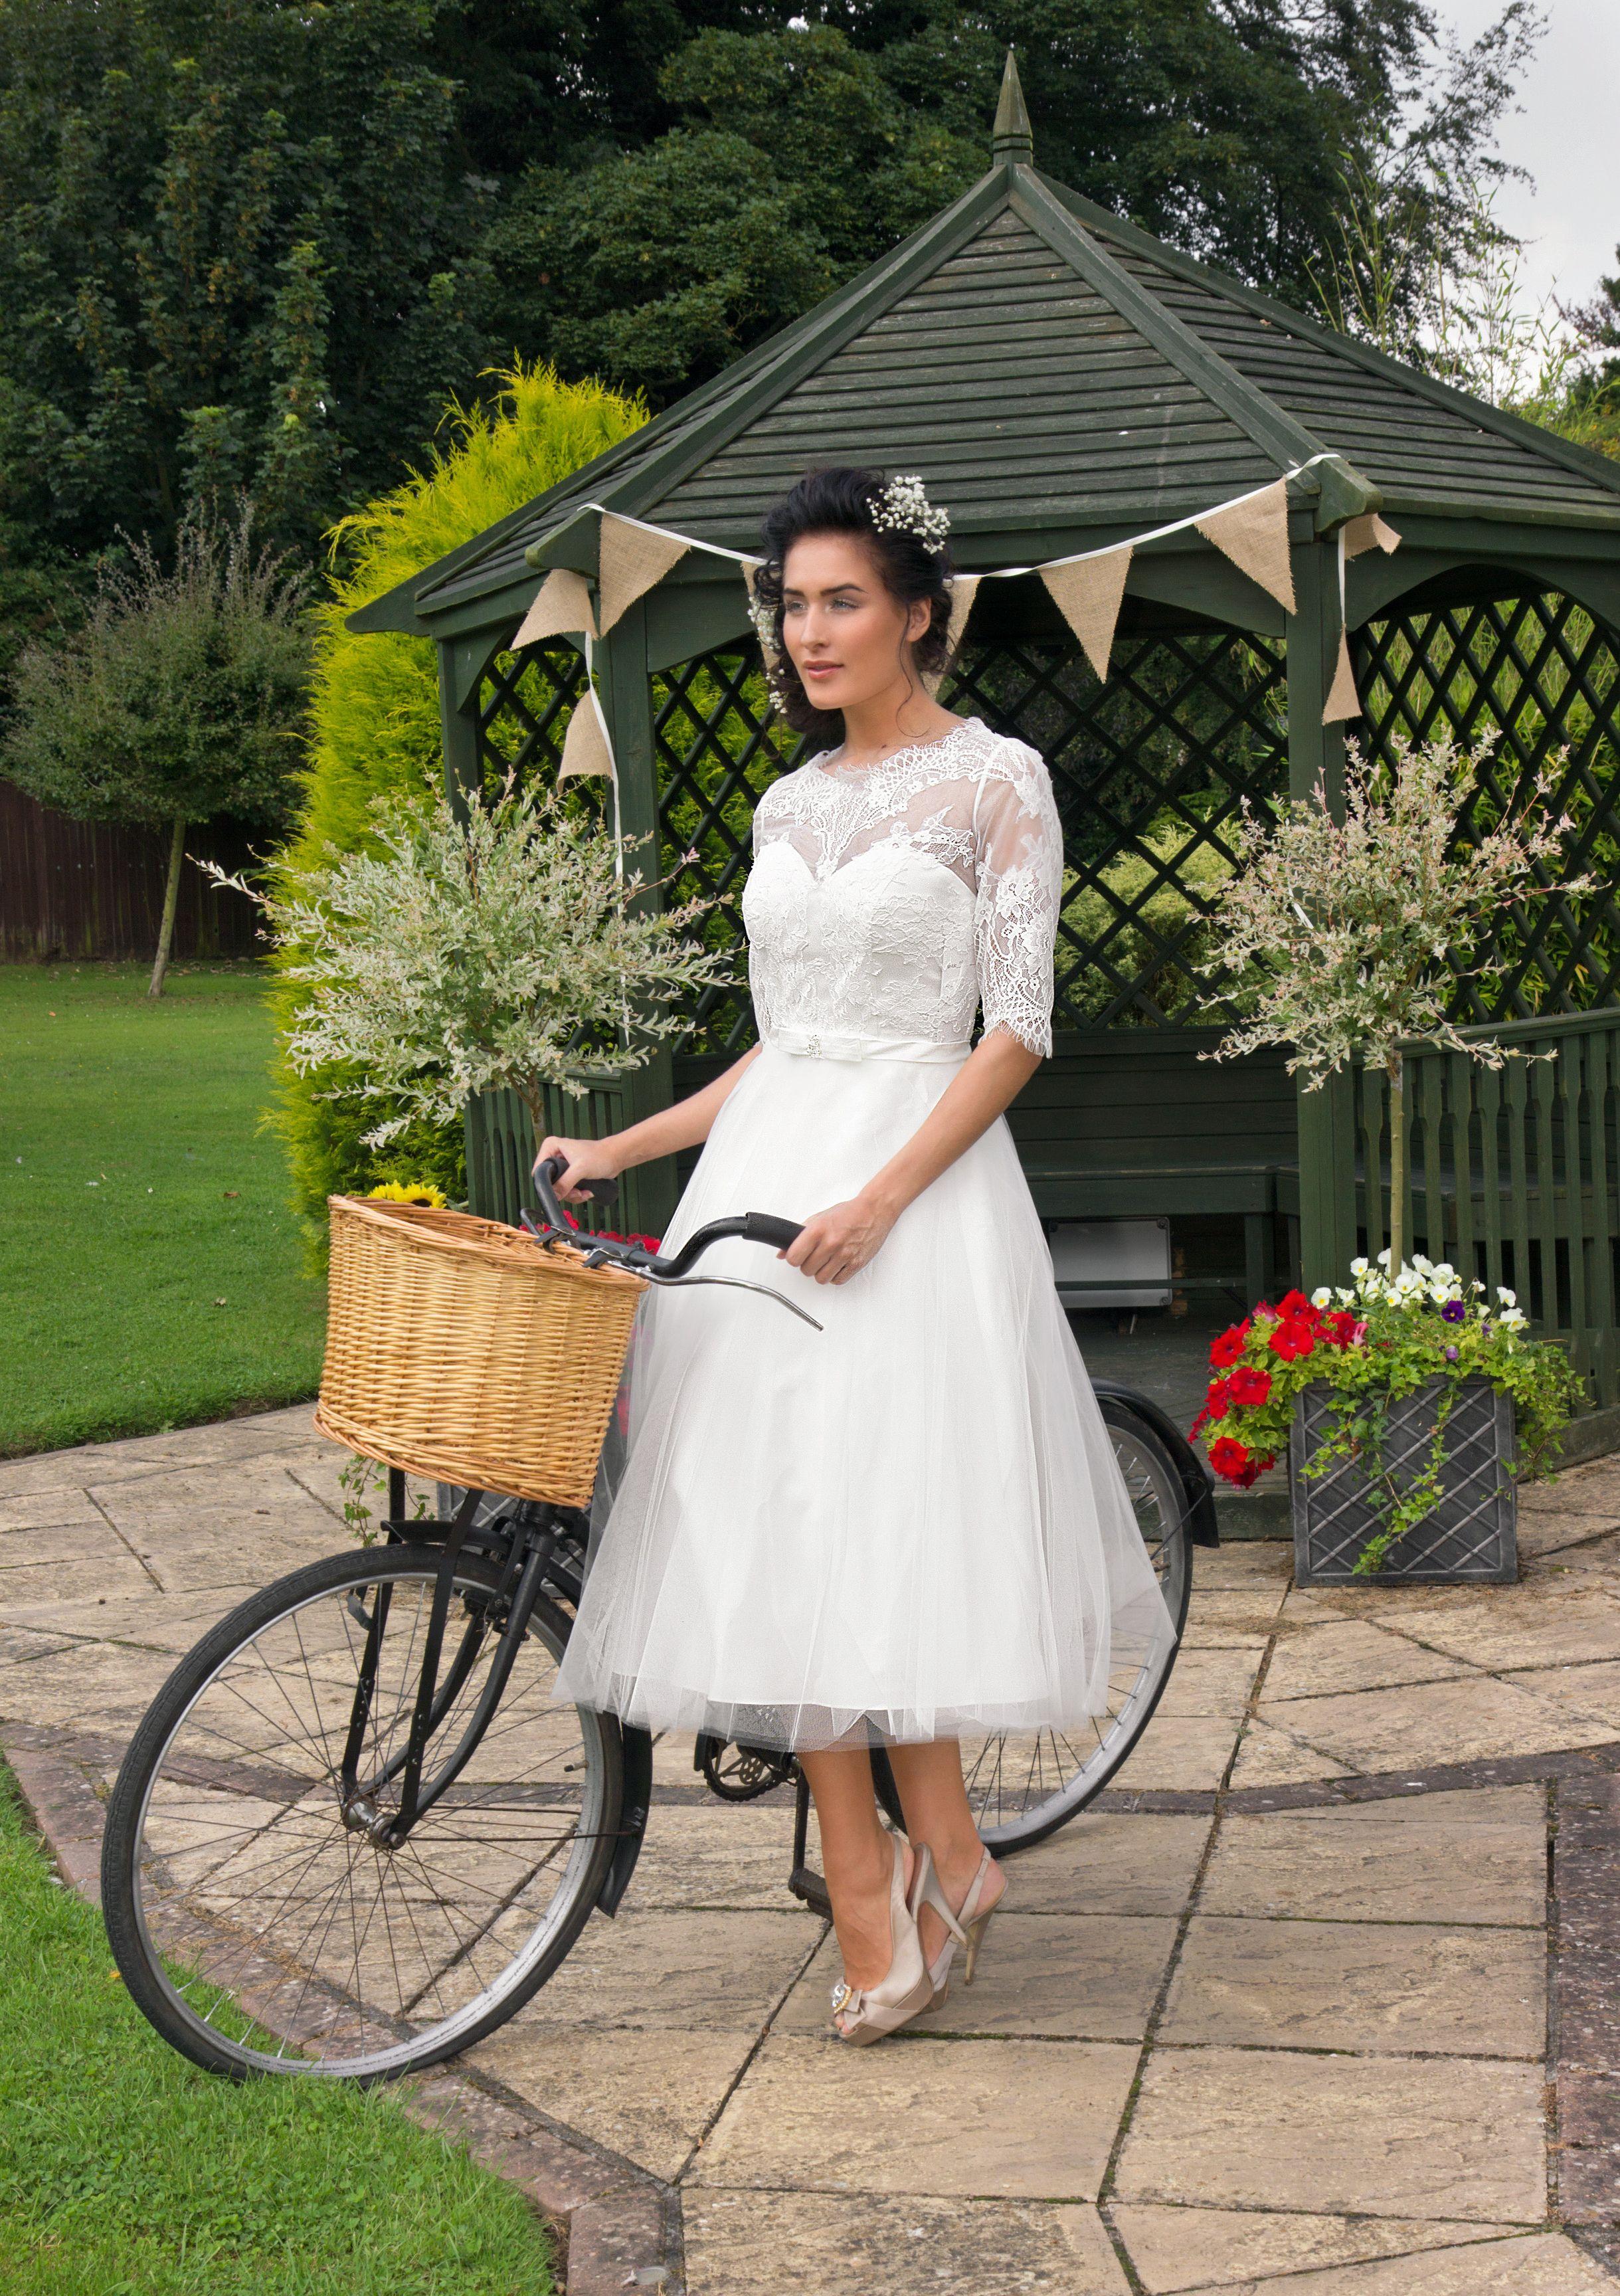 Wedding Dress Outlet - Brides & Bridesmaids Burton on Trent Complete ...